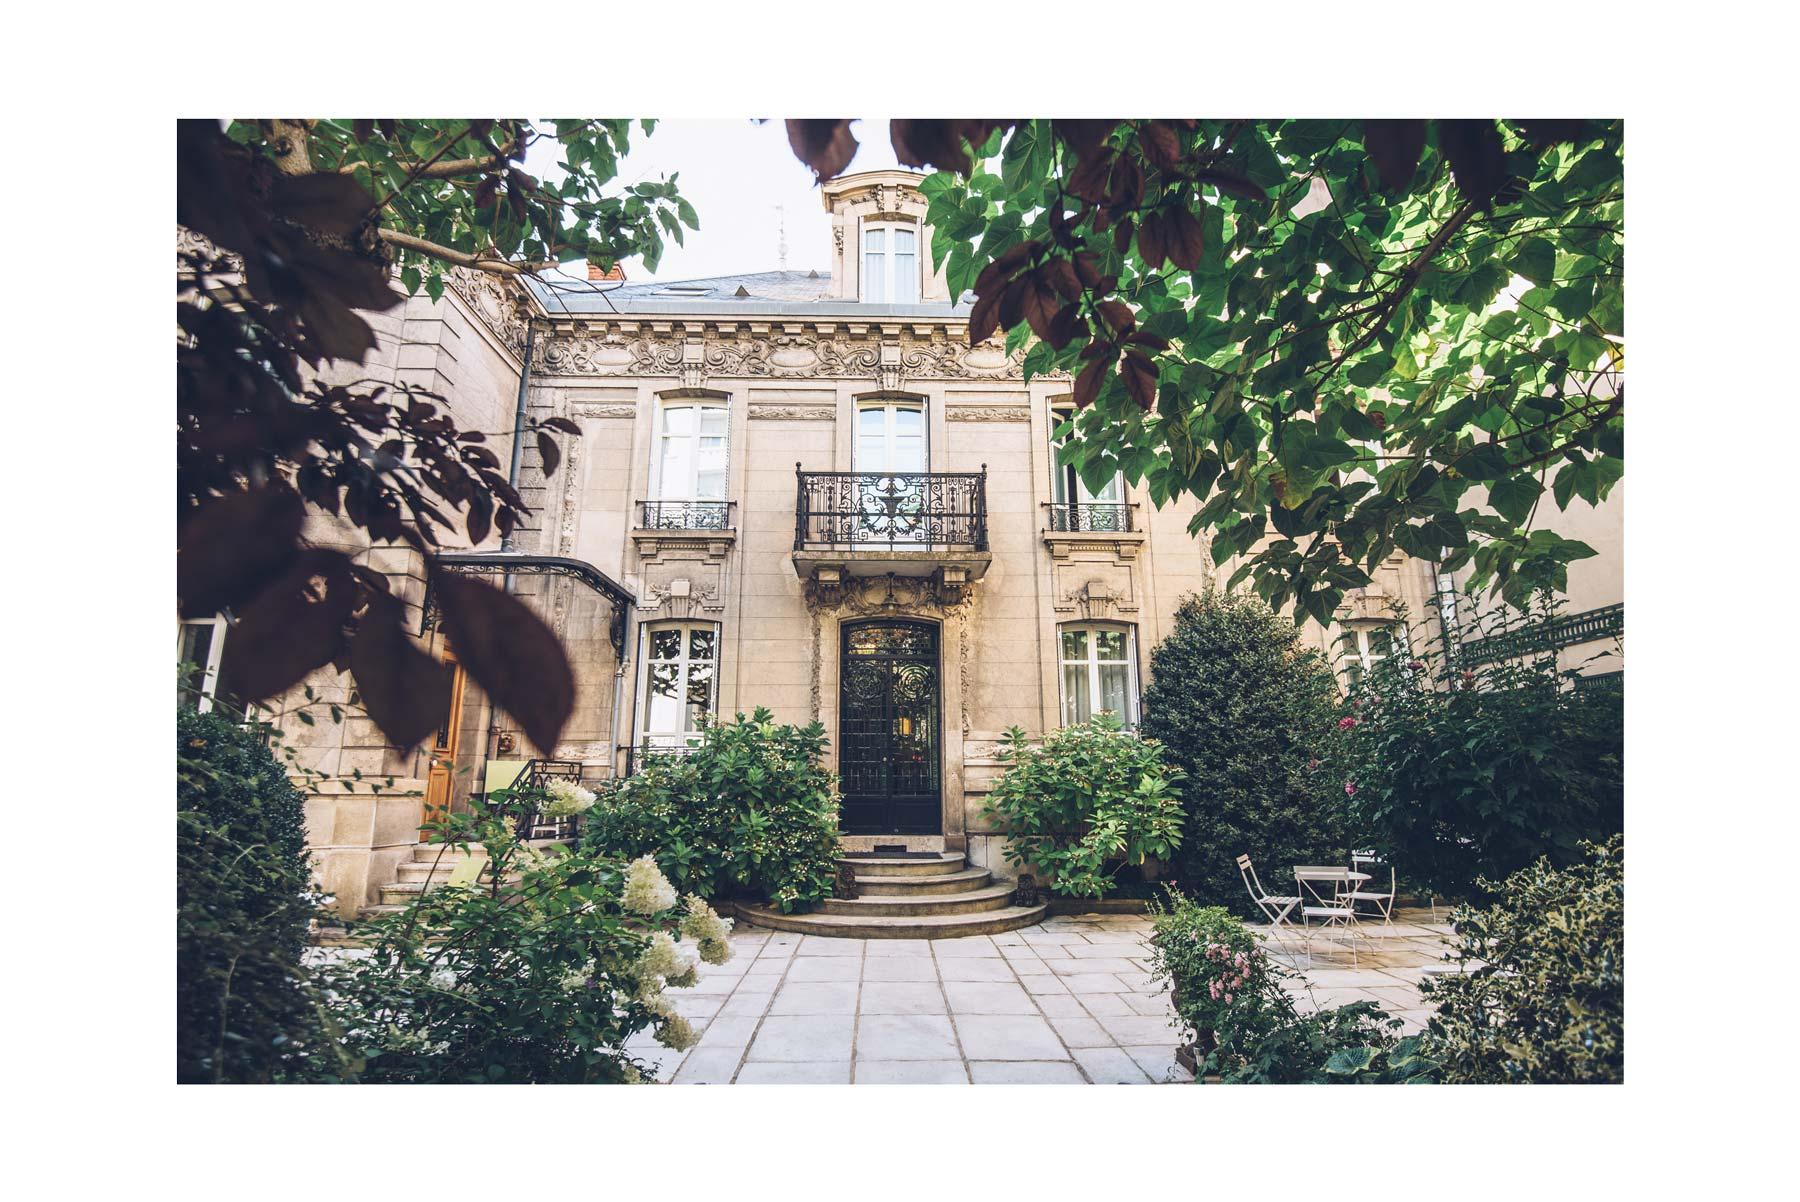 Maison d'hotes Vichy